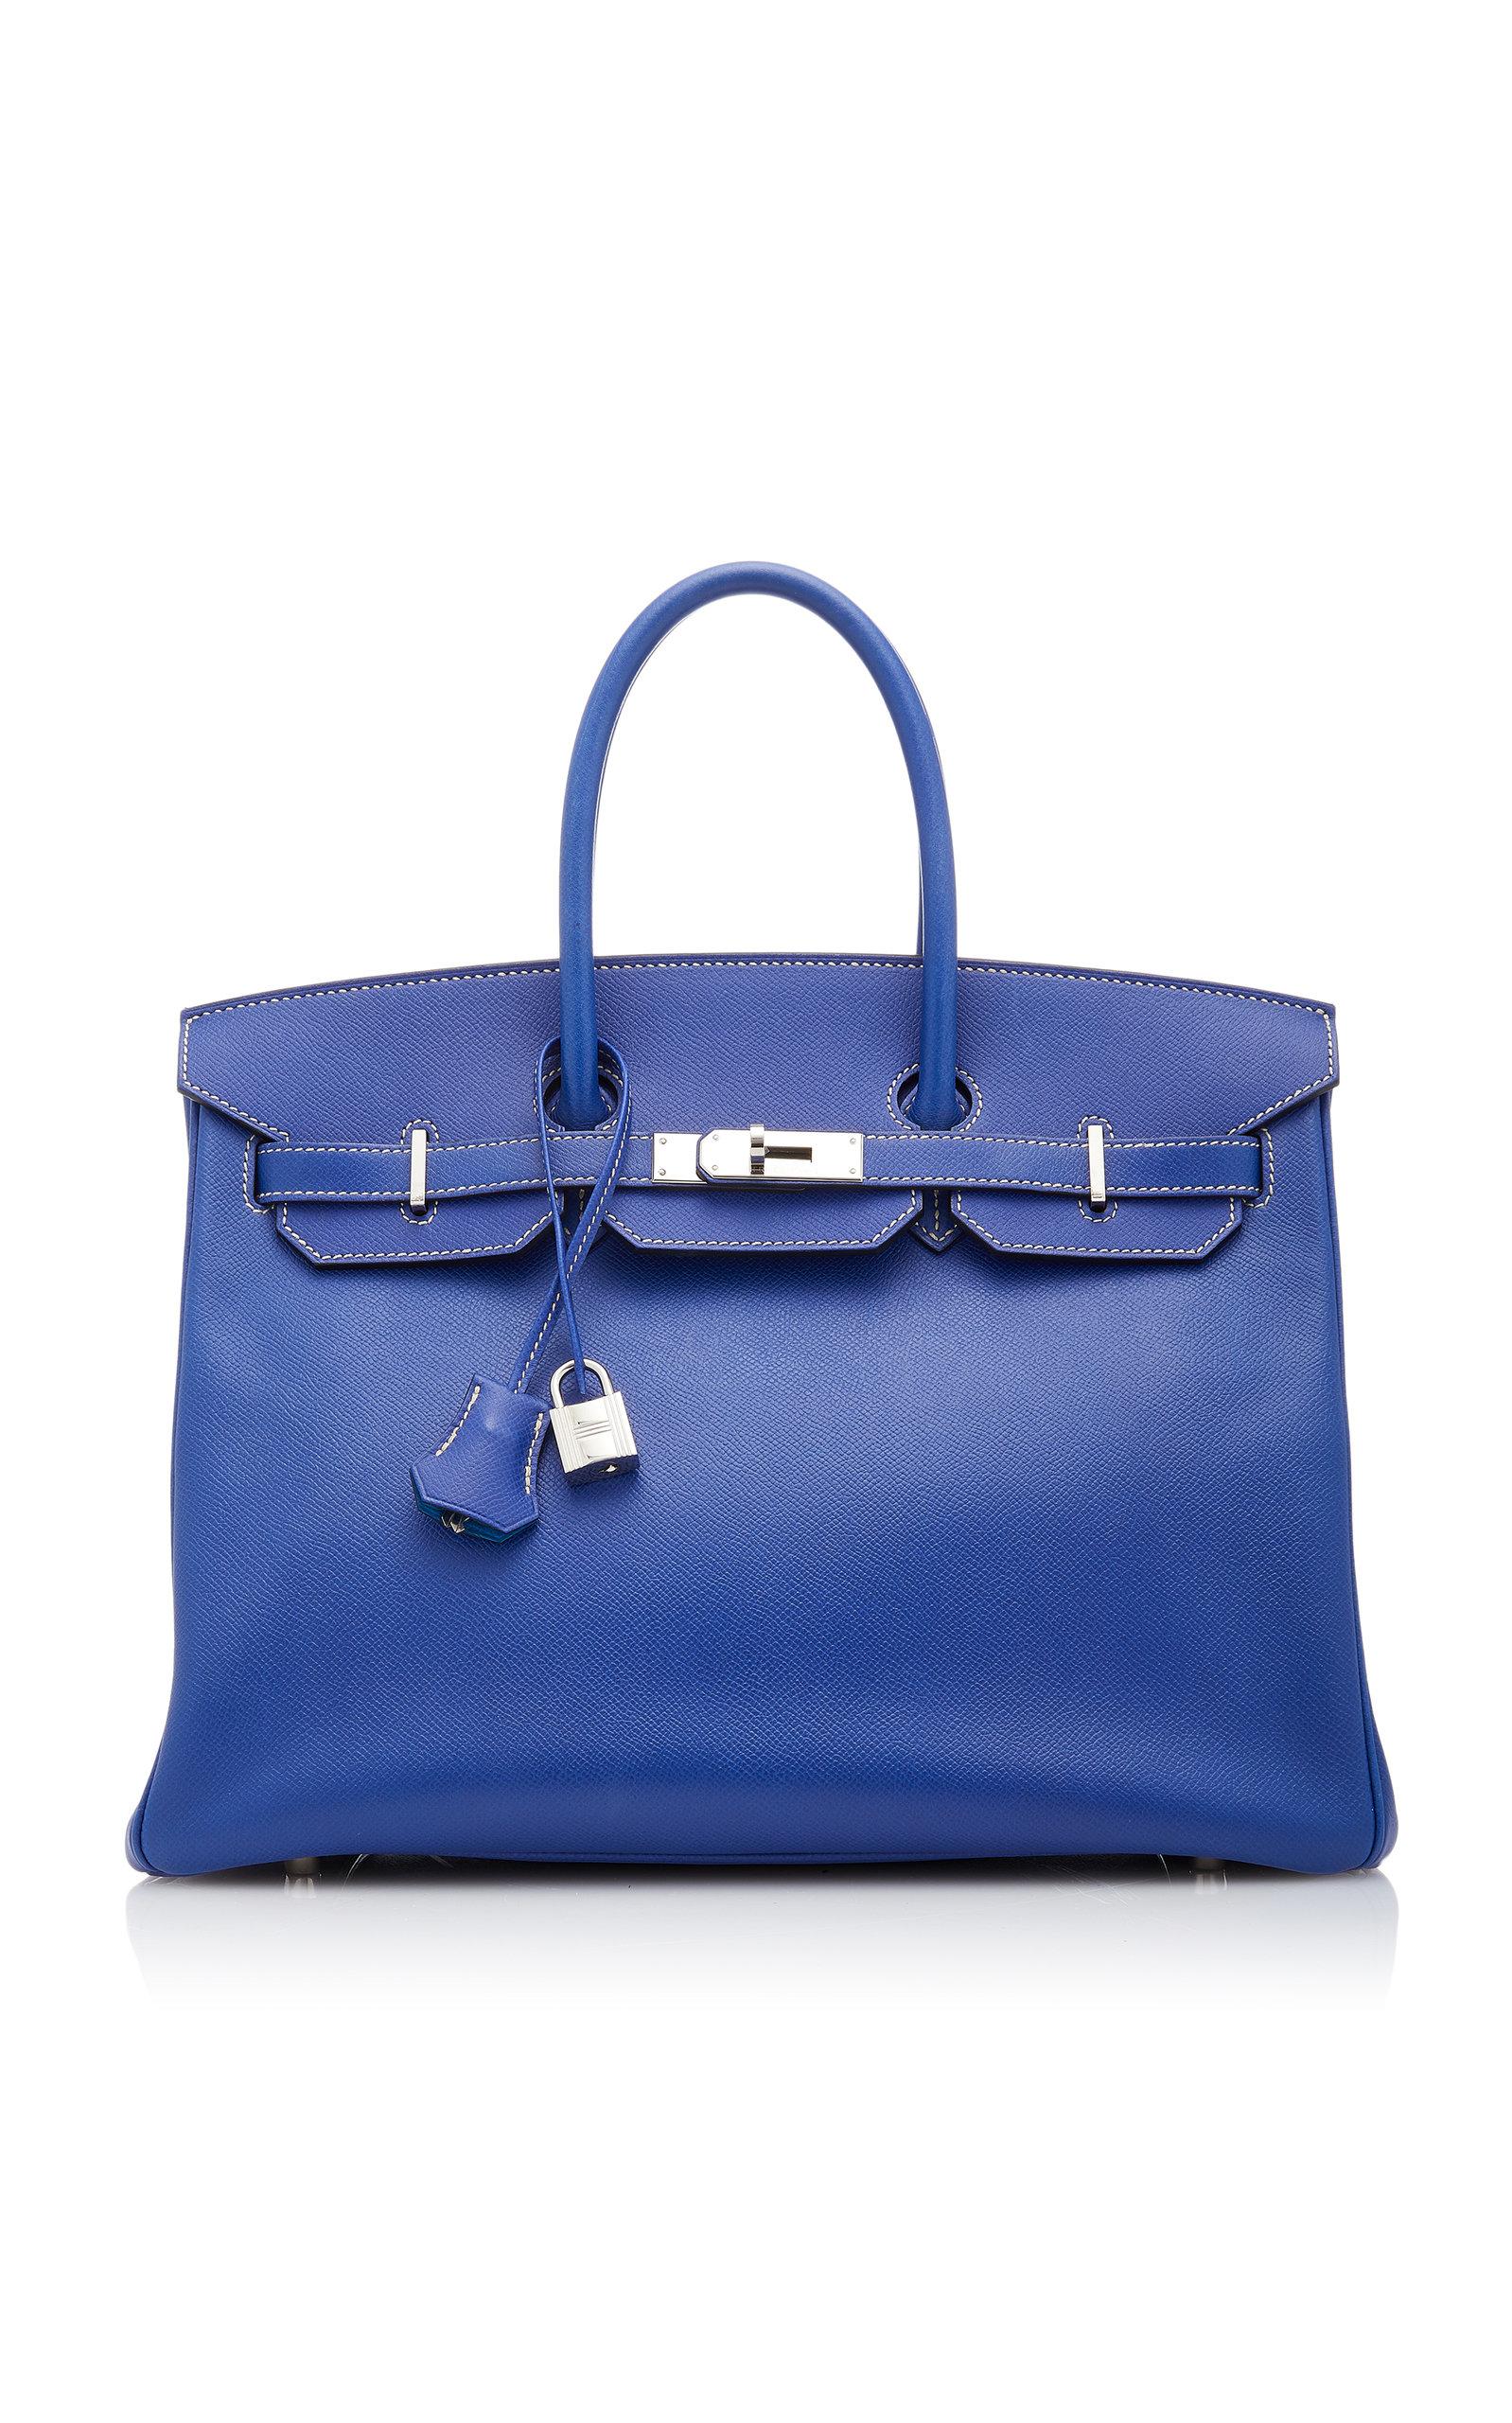 HermÈS Vintage By Heritage Auctions HermÈS 35Cm Blue Electric Epsom Leather Candy Birkin